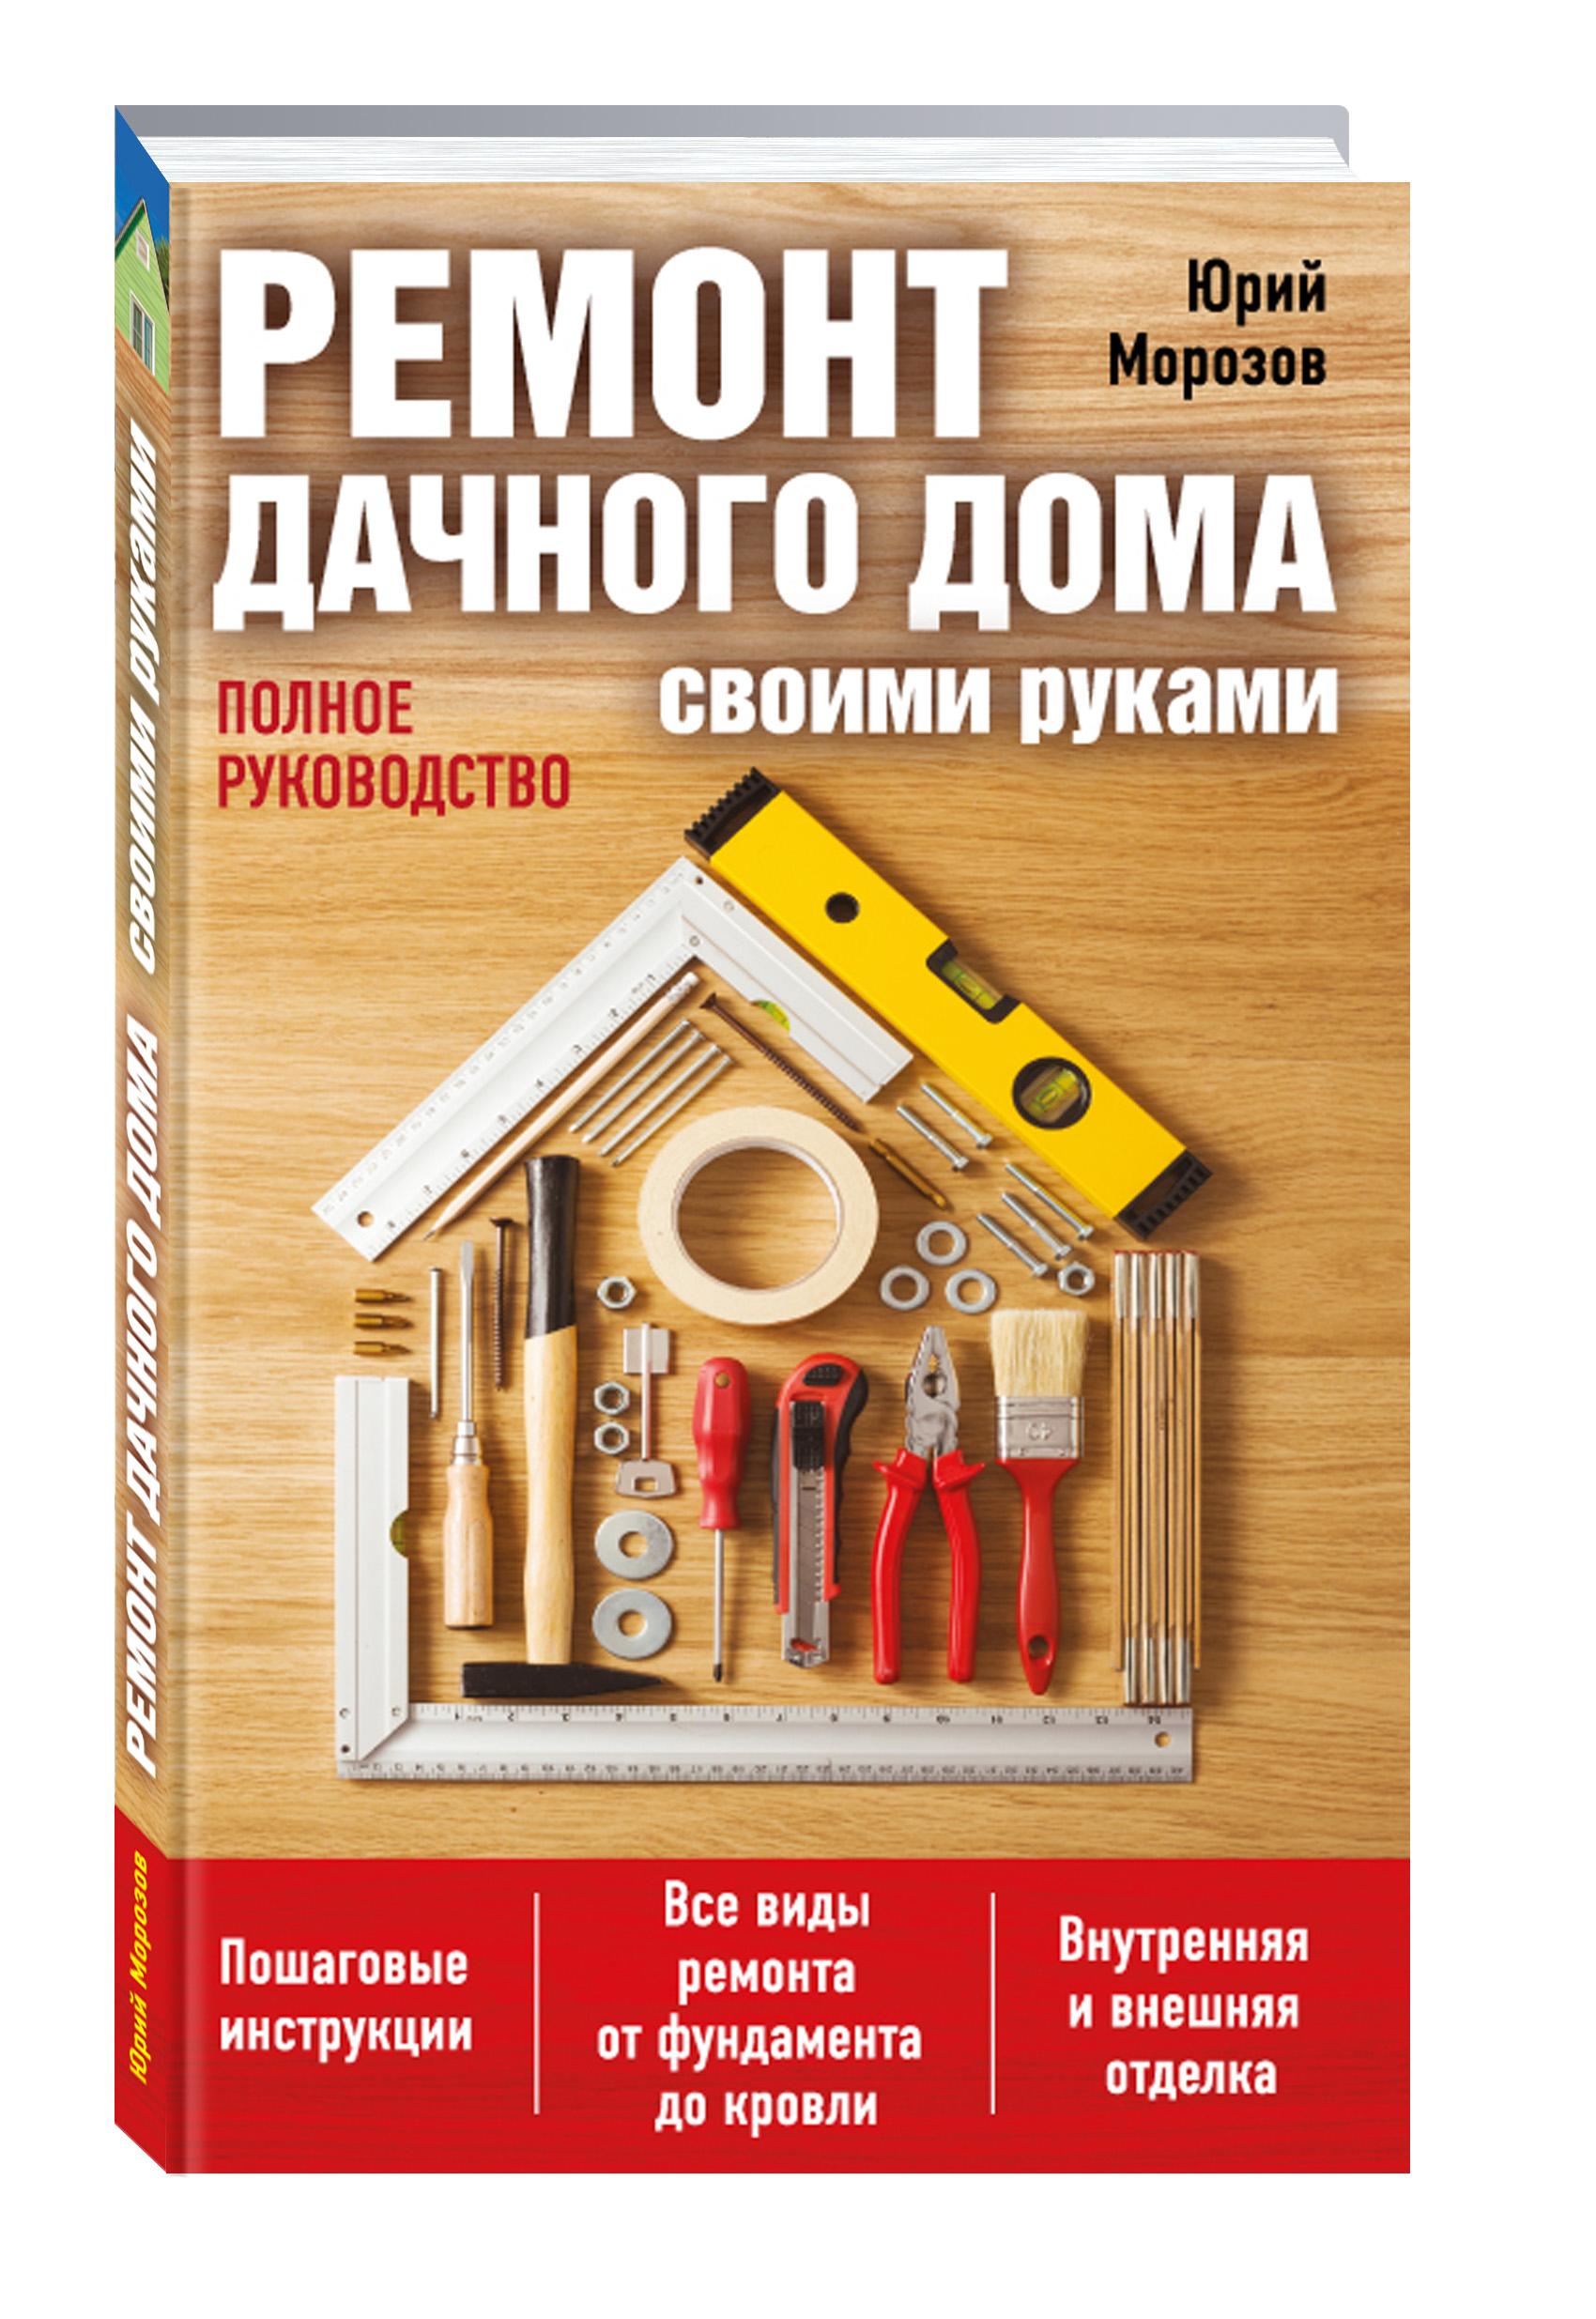 Морозов Ю.А. Ремонт дачного дома своими руками